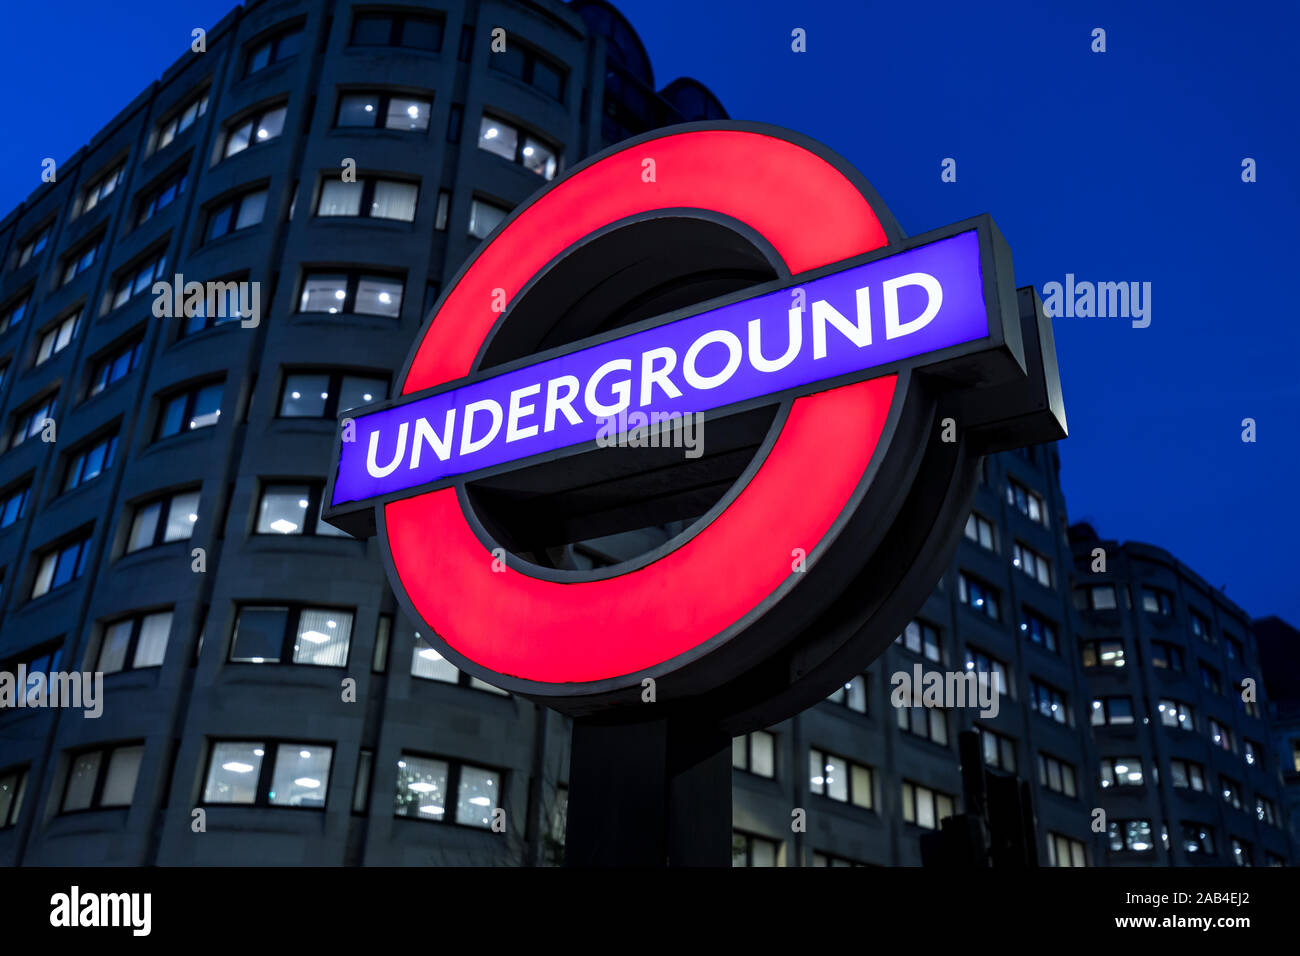 LONDON - NOVEMBER 20, 2019: London Underground tube red logo sign train station at night Stock Photo